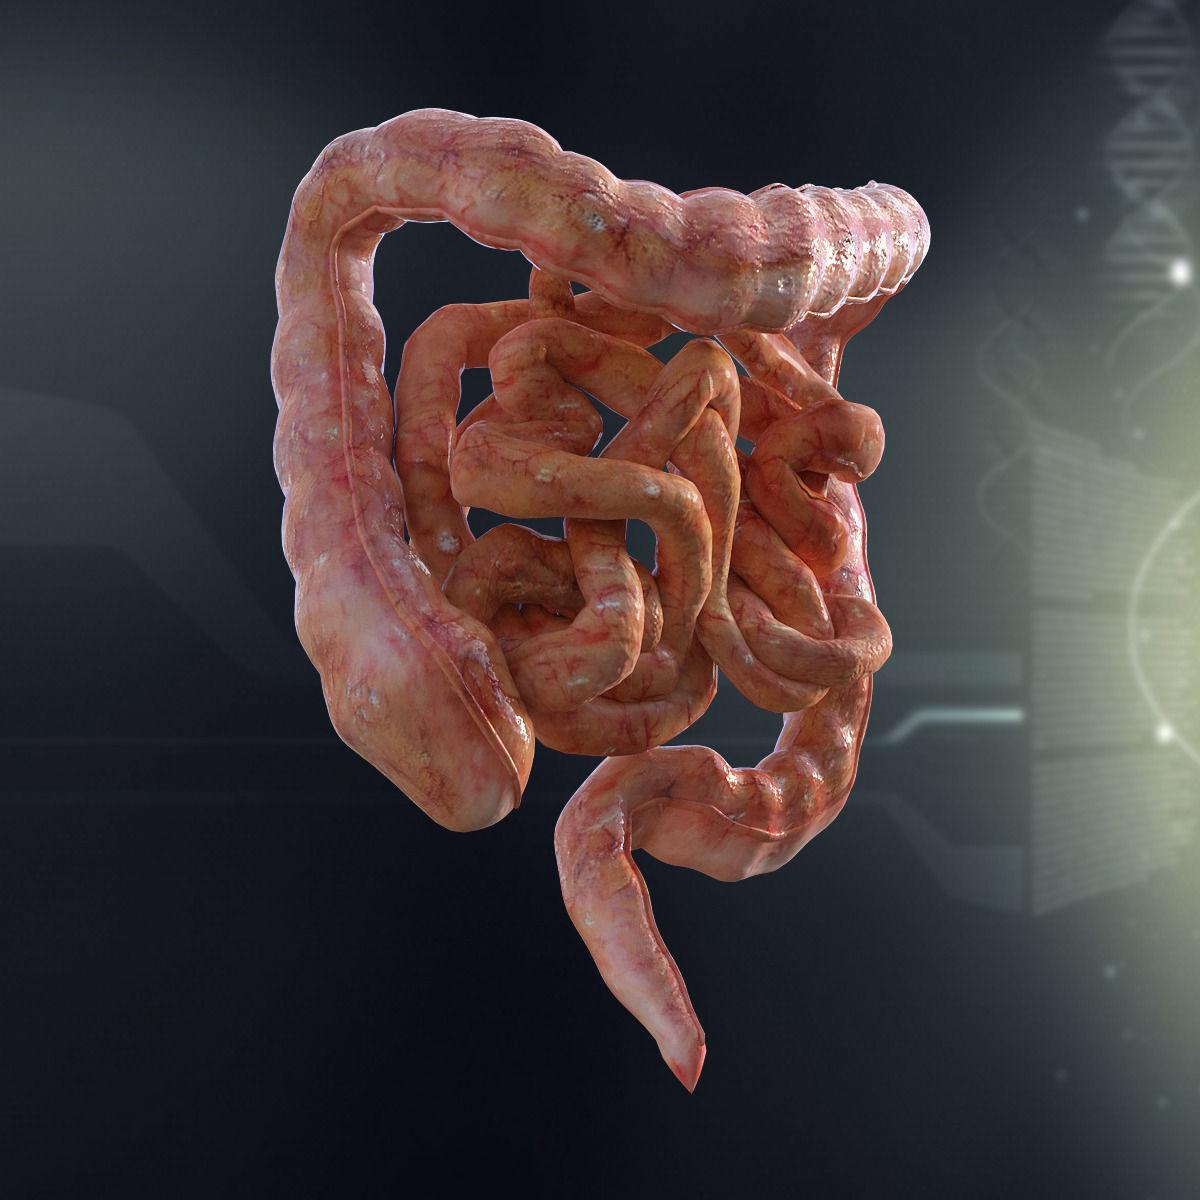 3D Human Small and Large Intestines Anatomy | CGTrader